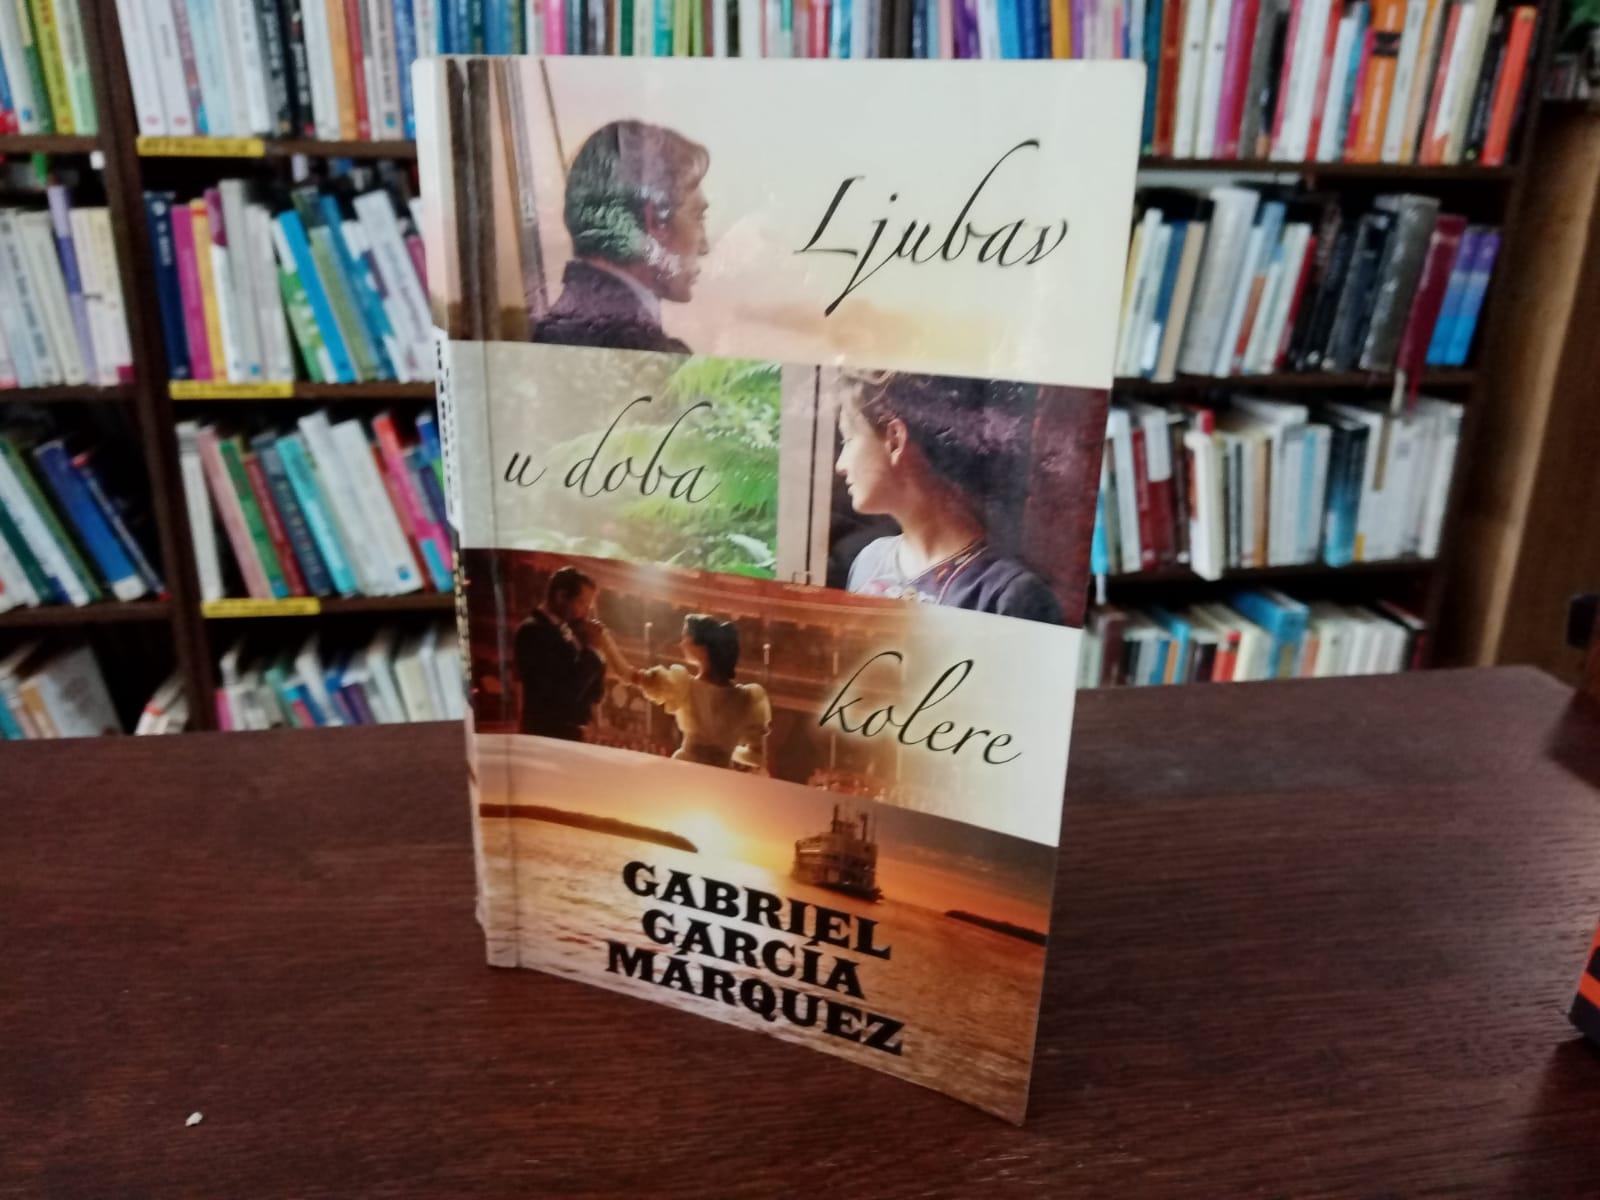 Gabriel García Márquez : Ljubav u doba kolere – čitateljski osvrt Tomislava Mlinca